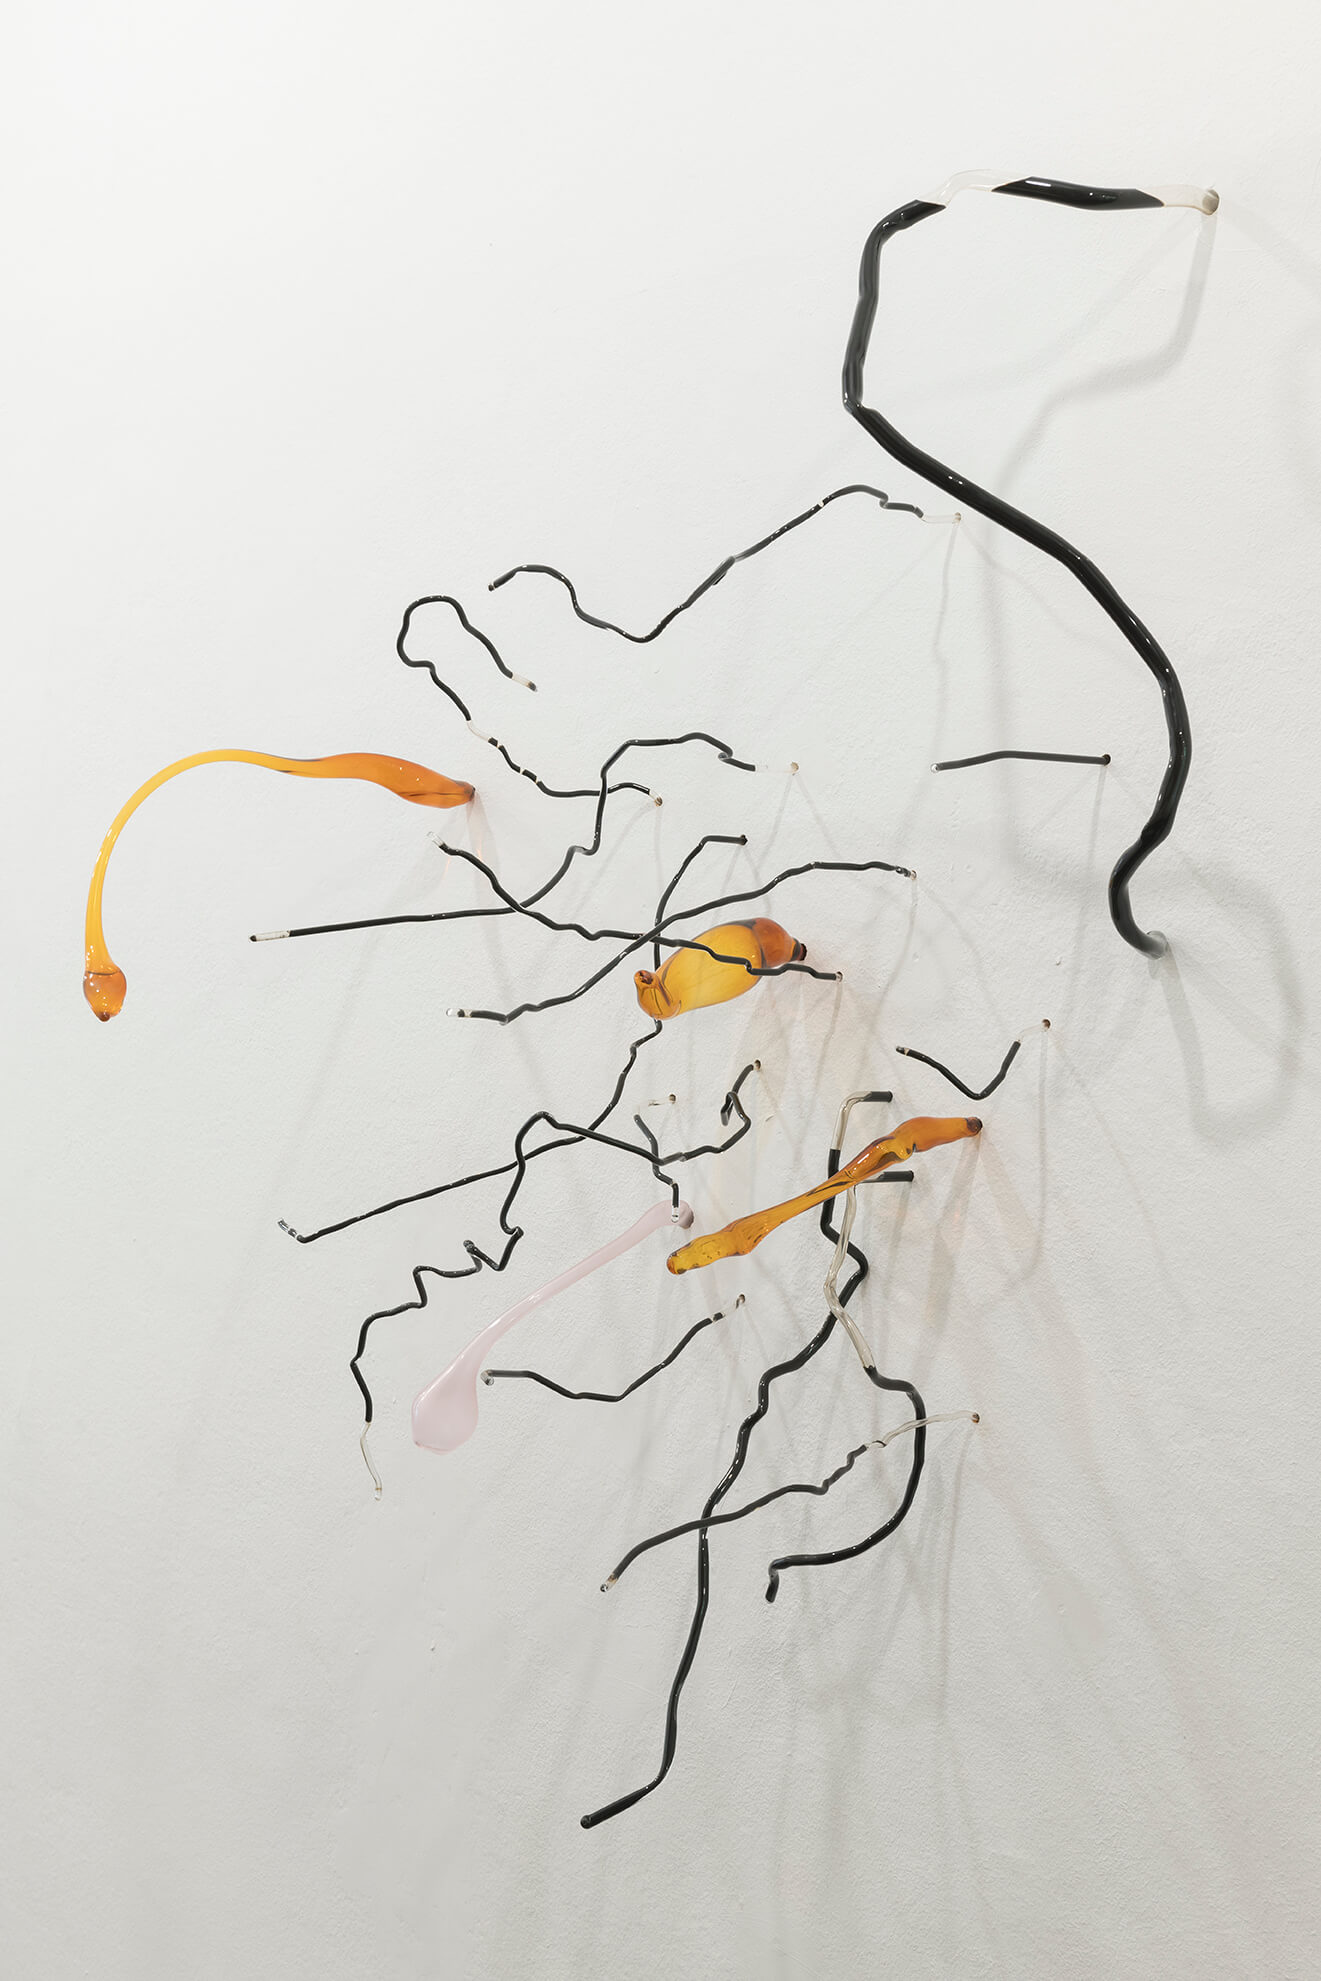 Untitled, 2019 | Lara Fluxà: Delu / Accrochage #5: Set Petites Històries | ProjecteSD